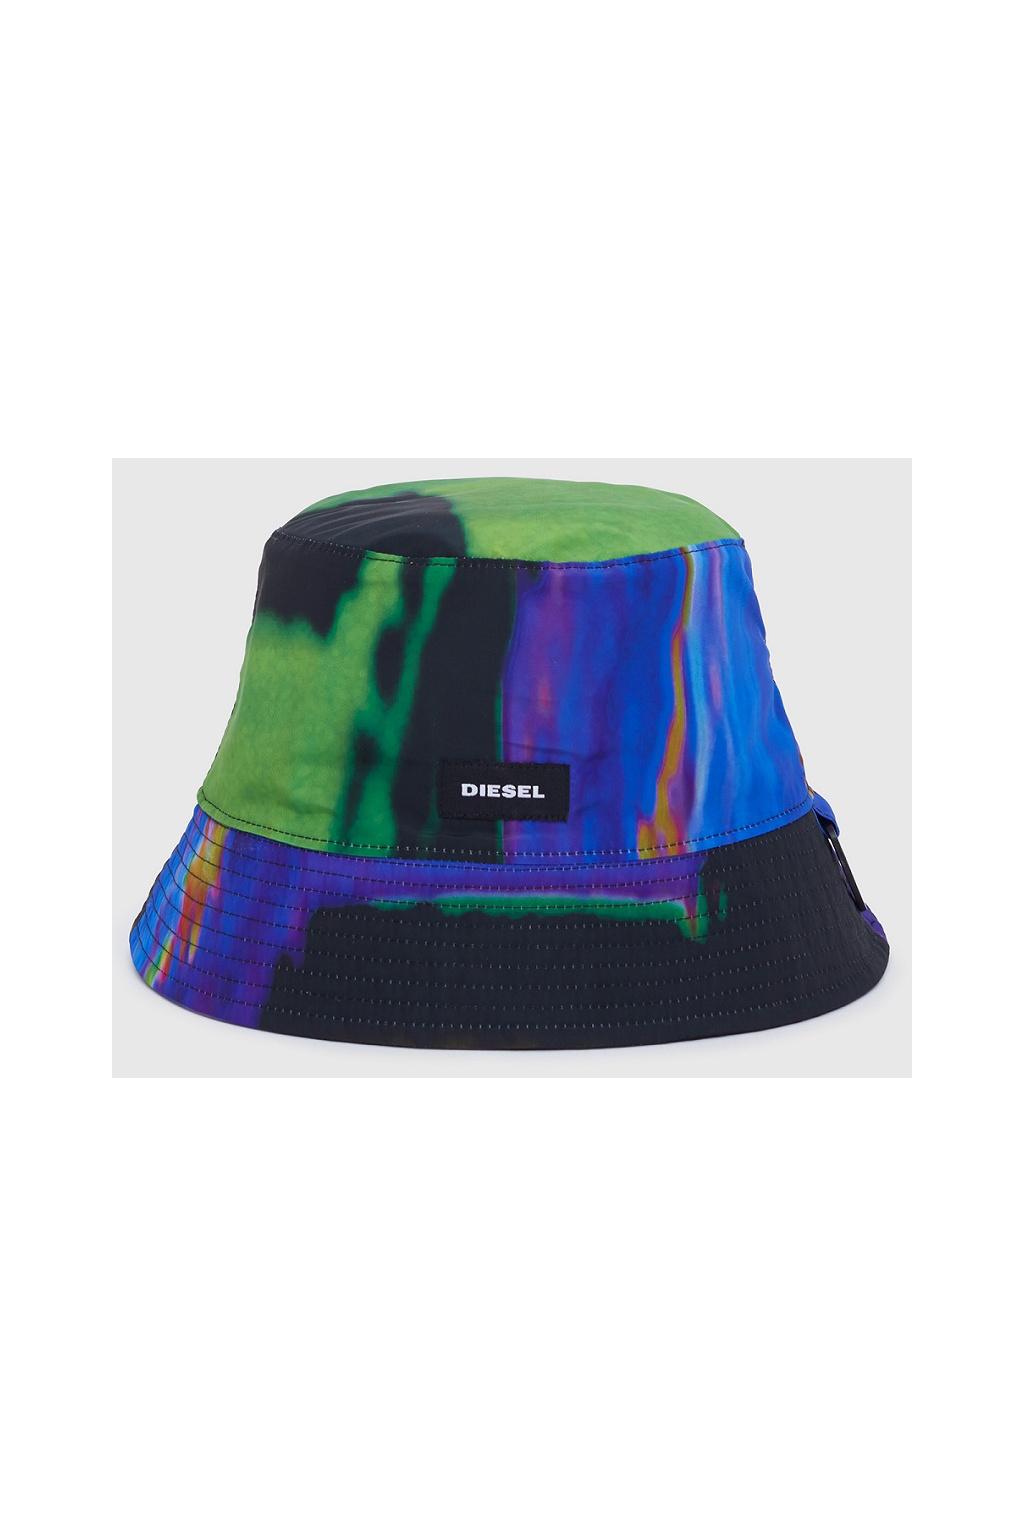 A01113 0KAZP 9XX Diesel klobouk vícebarevný